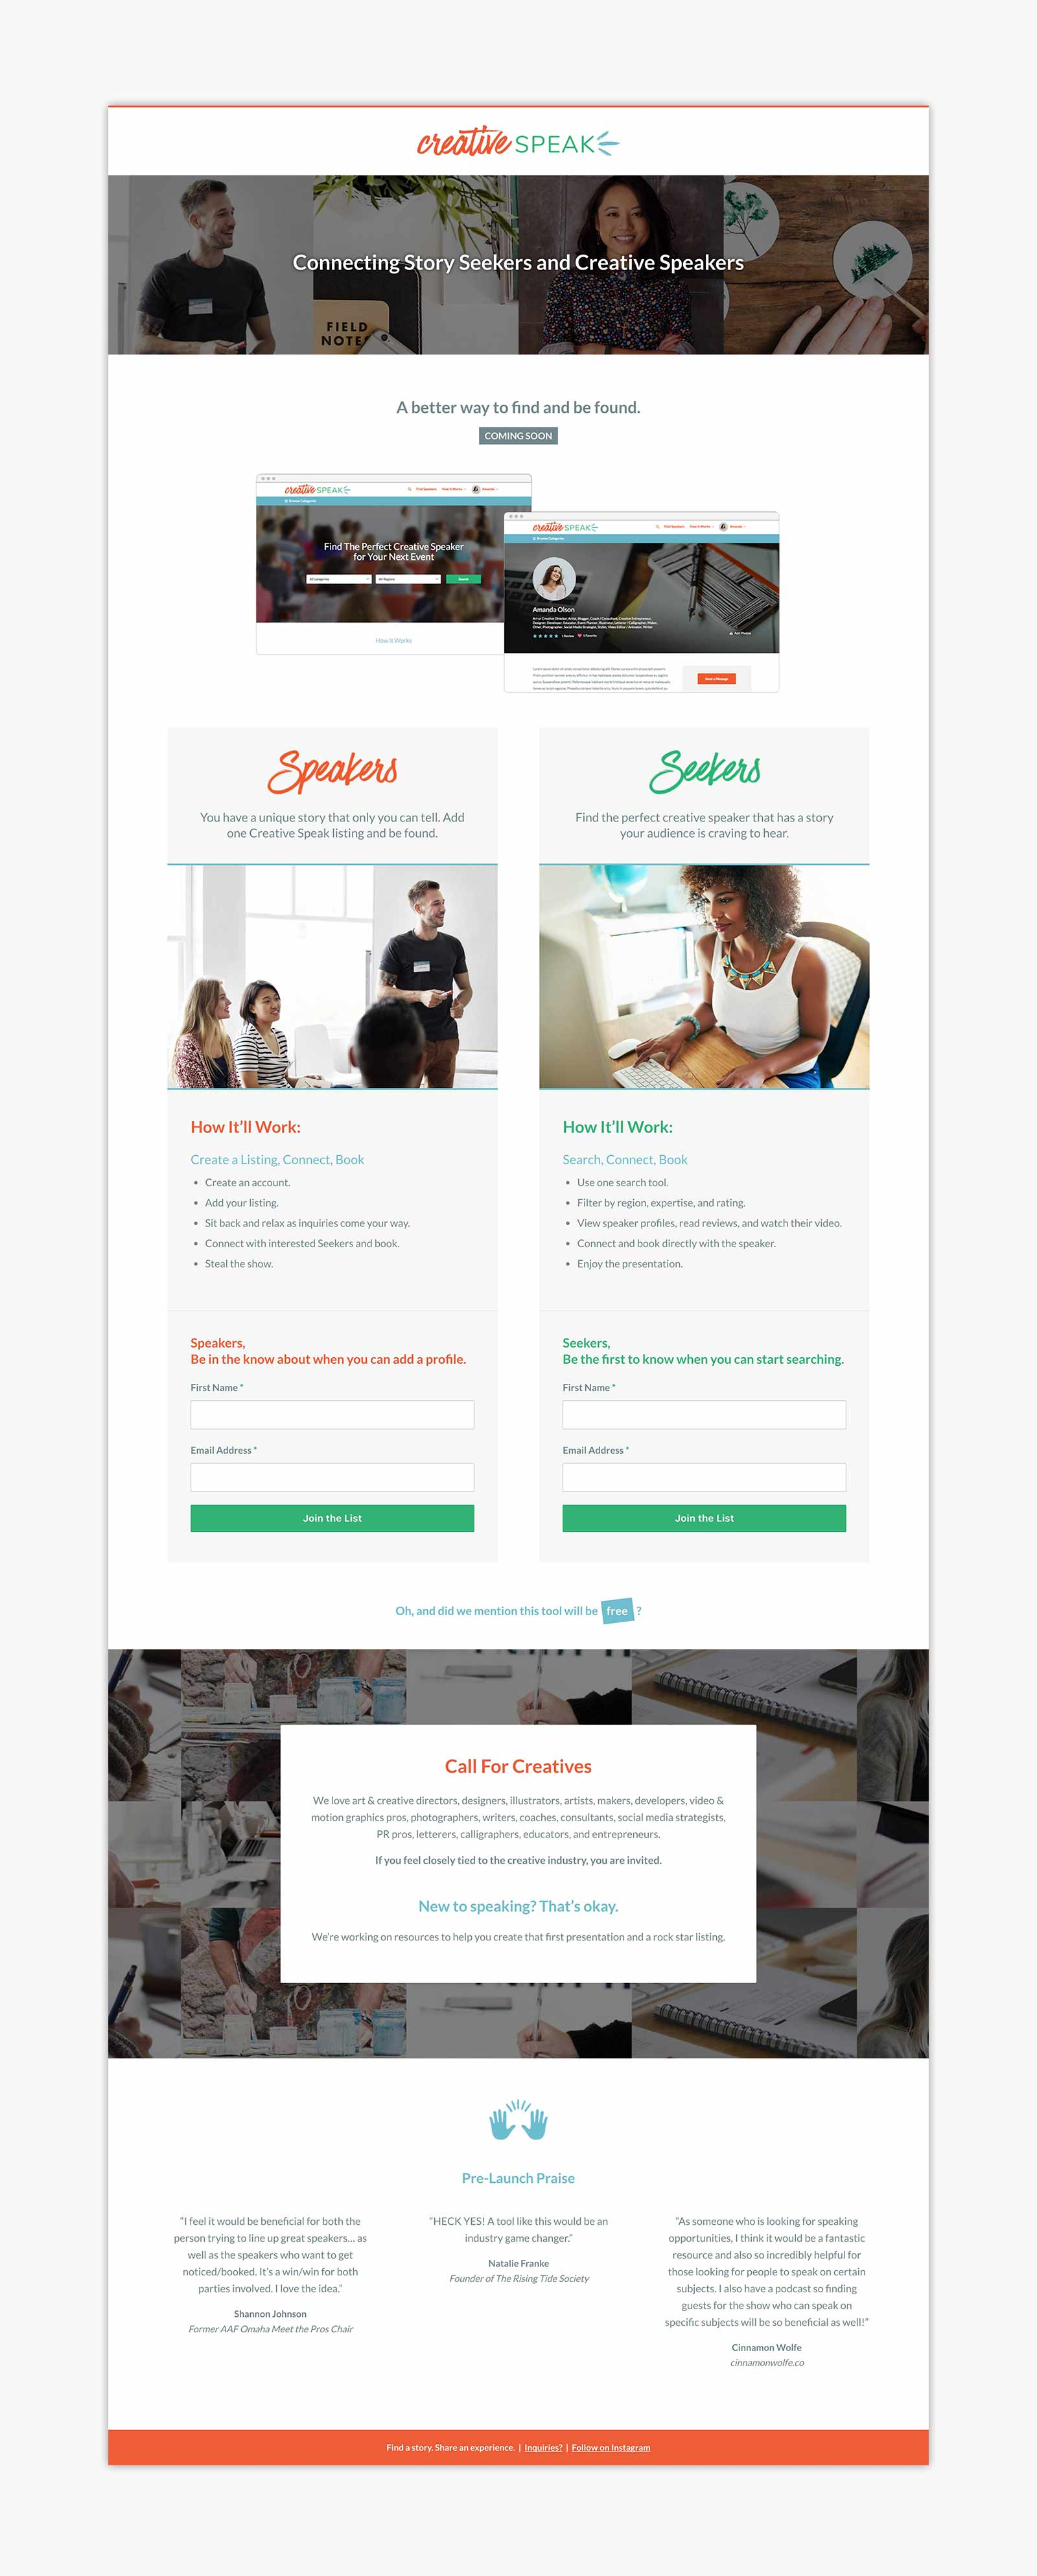 Creative Speak - Landing page layout design